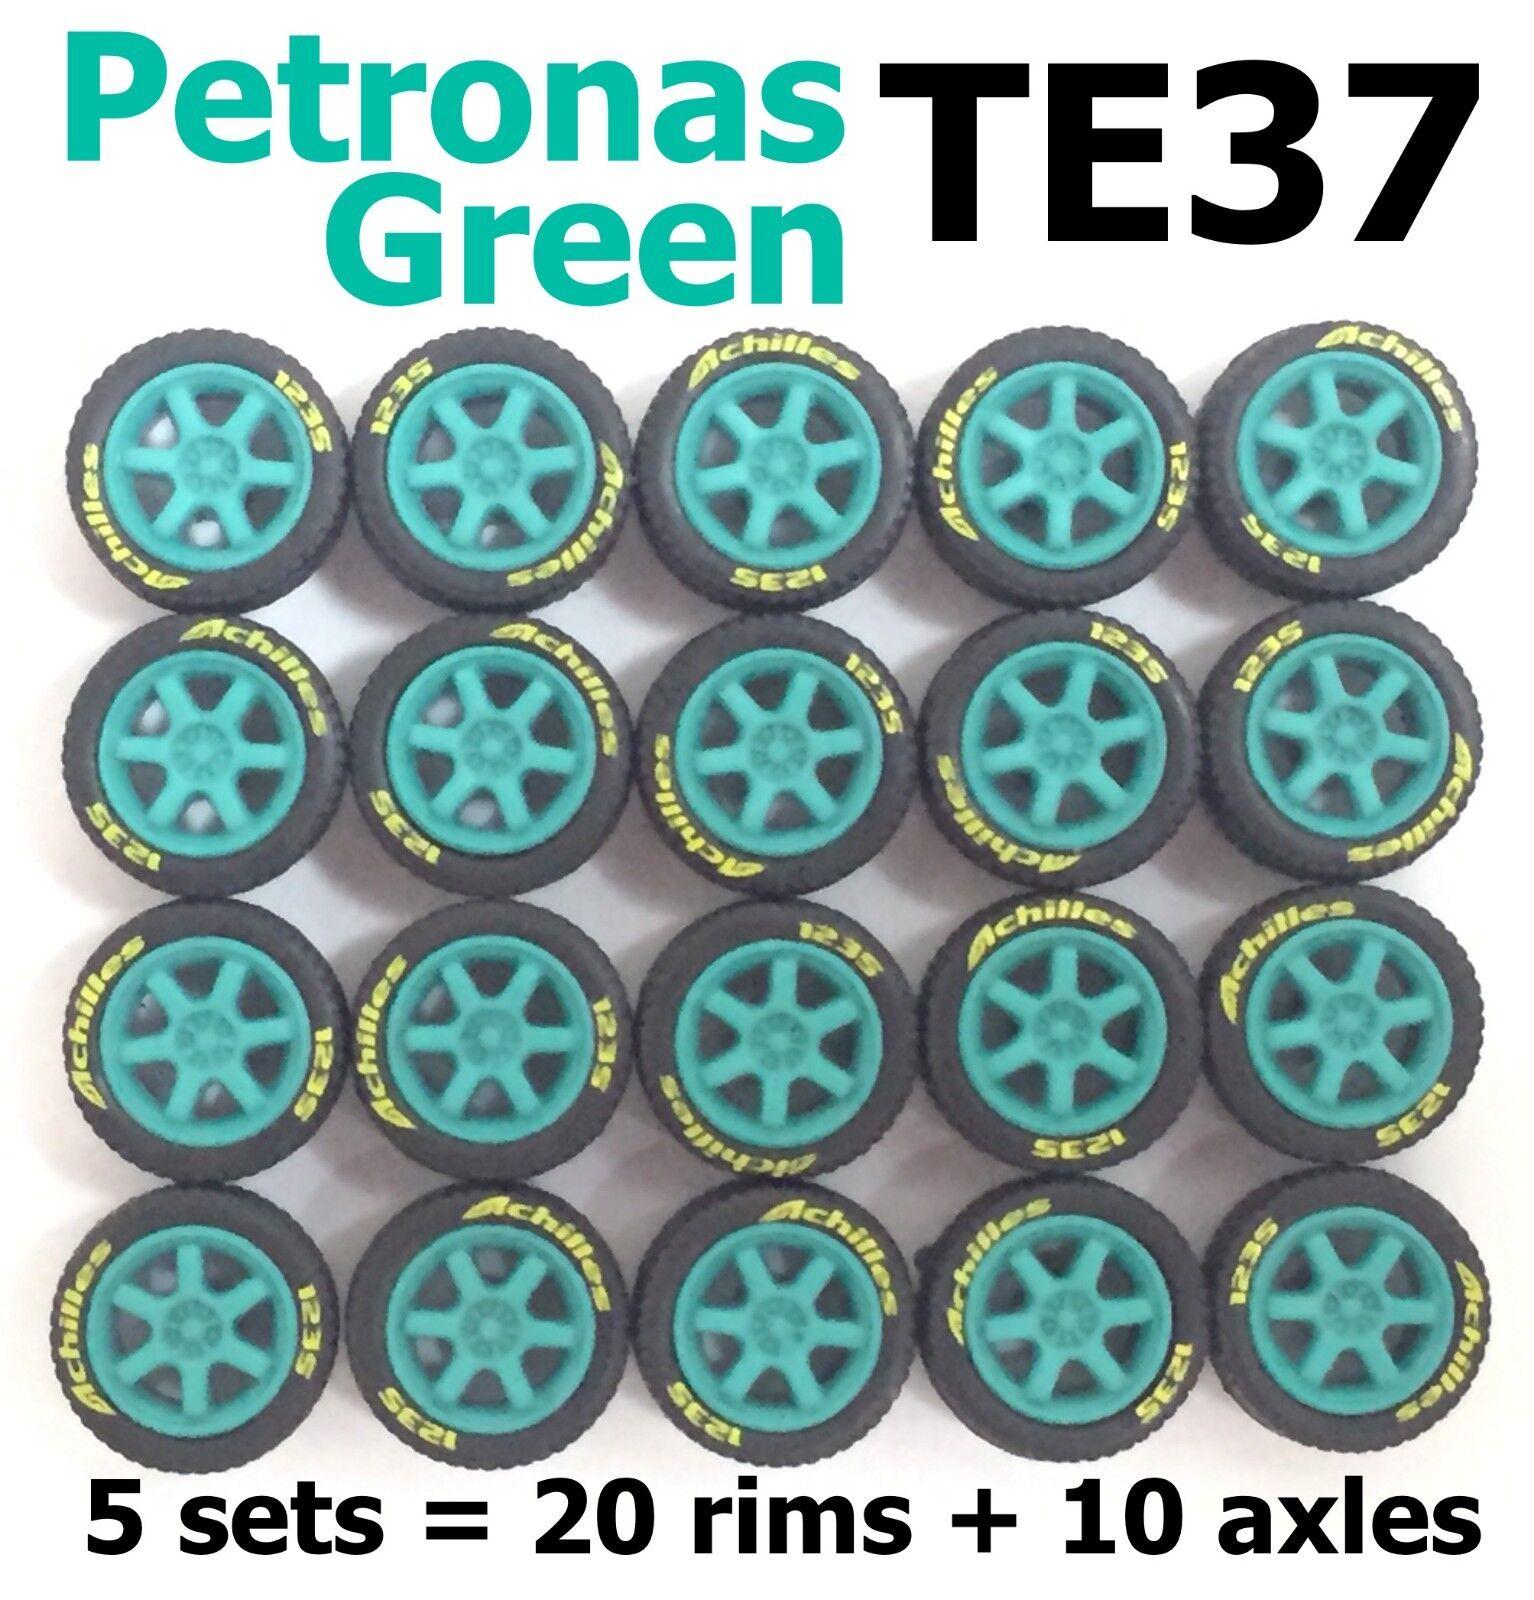 1 64 tires TE37 Petronas Greeen fit Hot Wheels diecast model cars - 5 sets